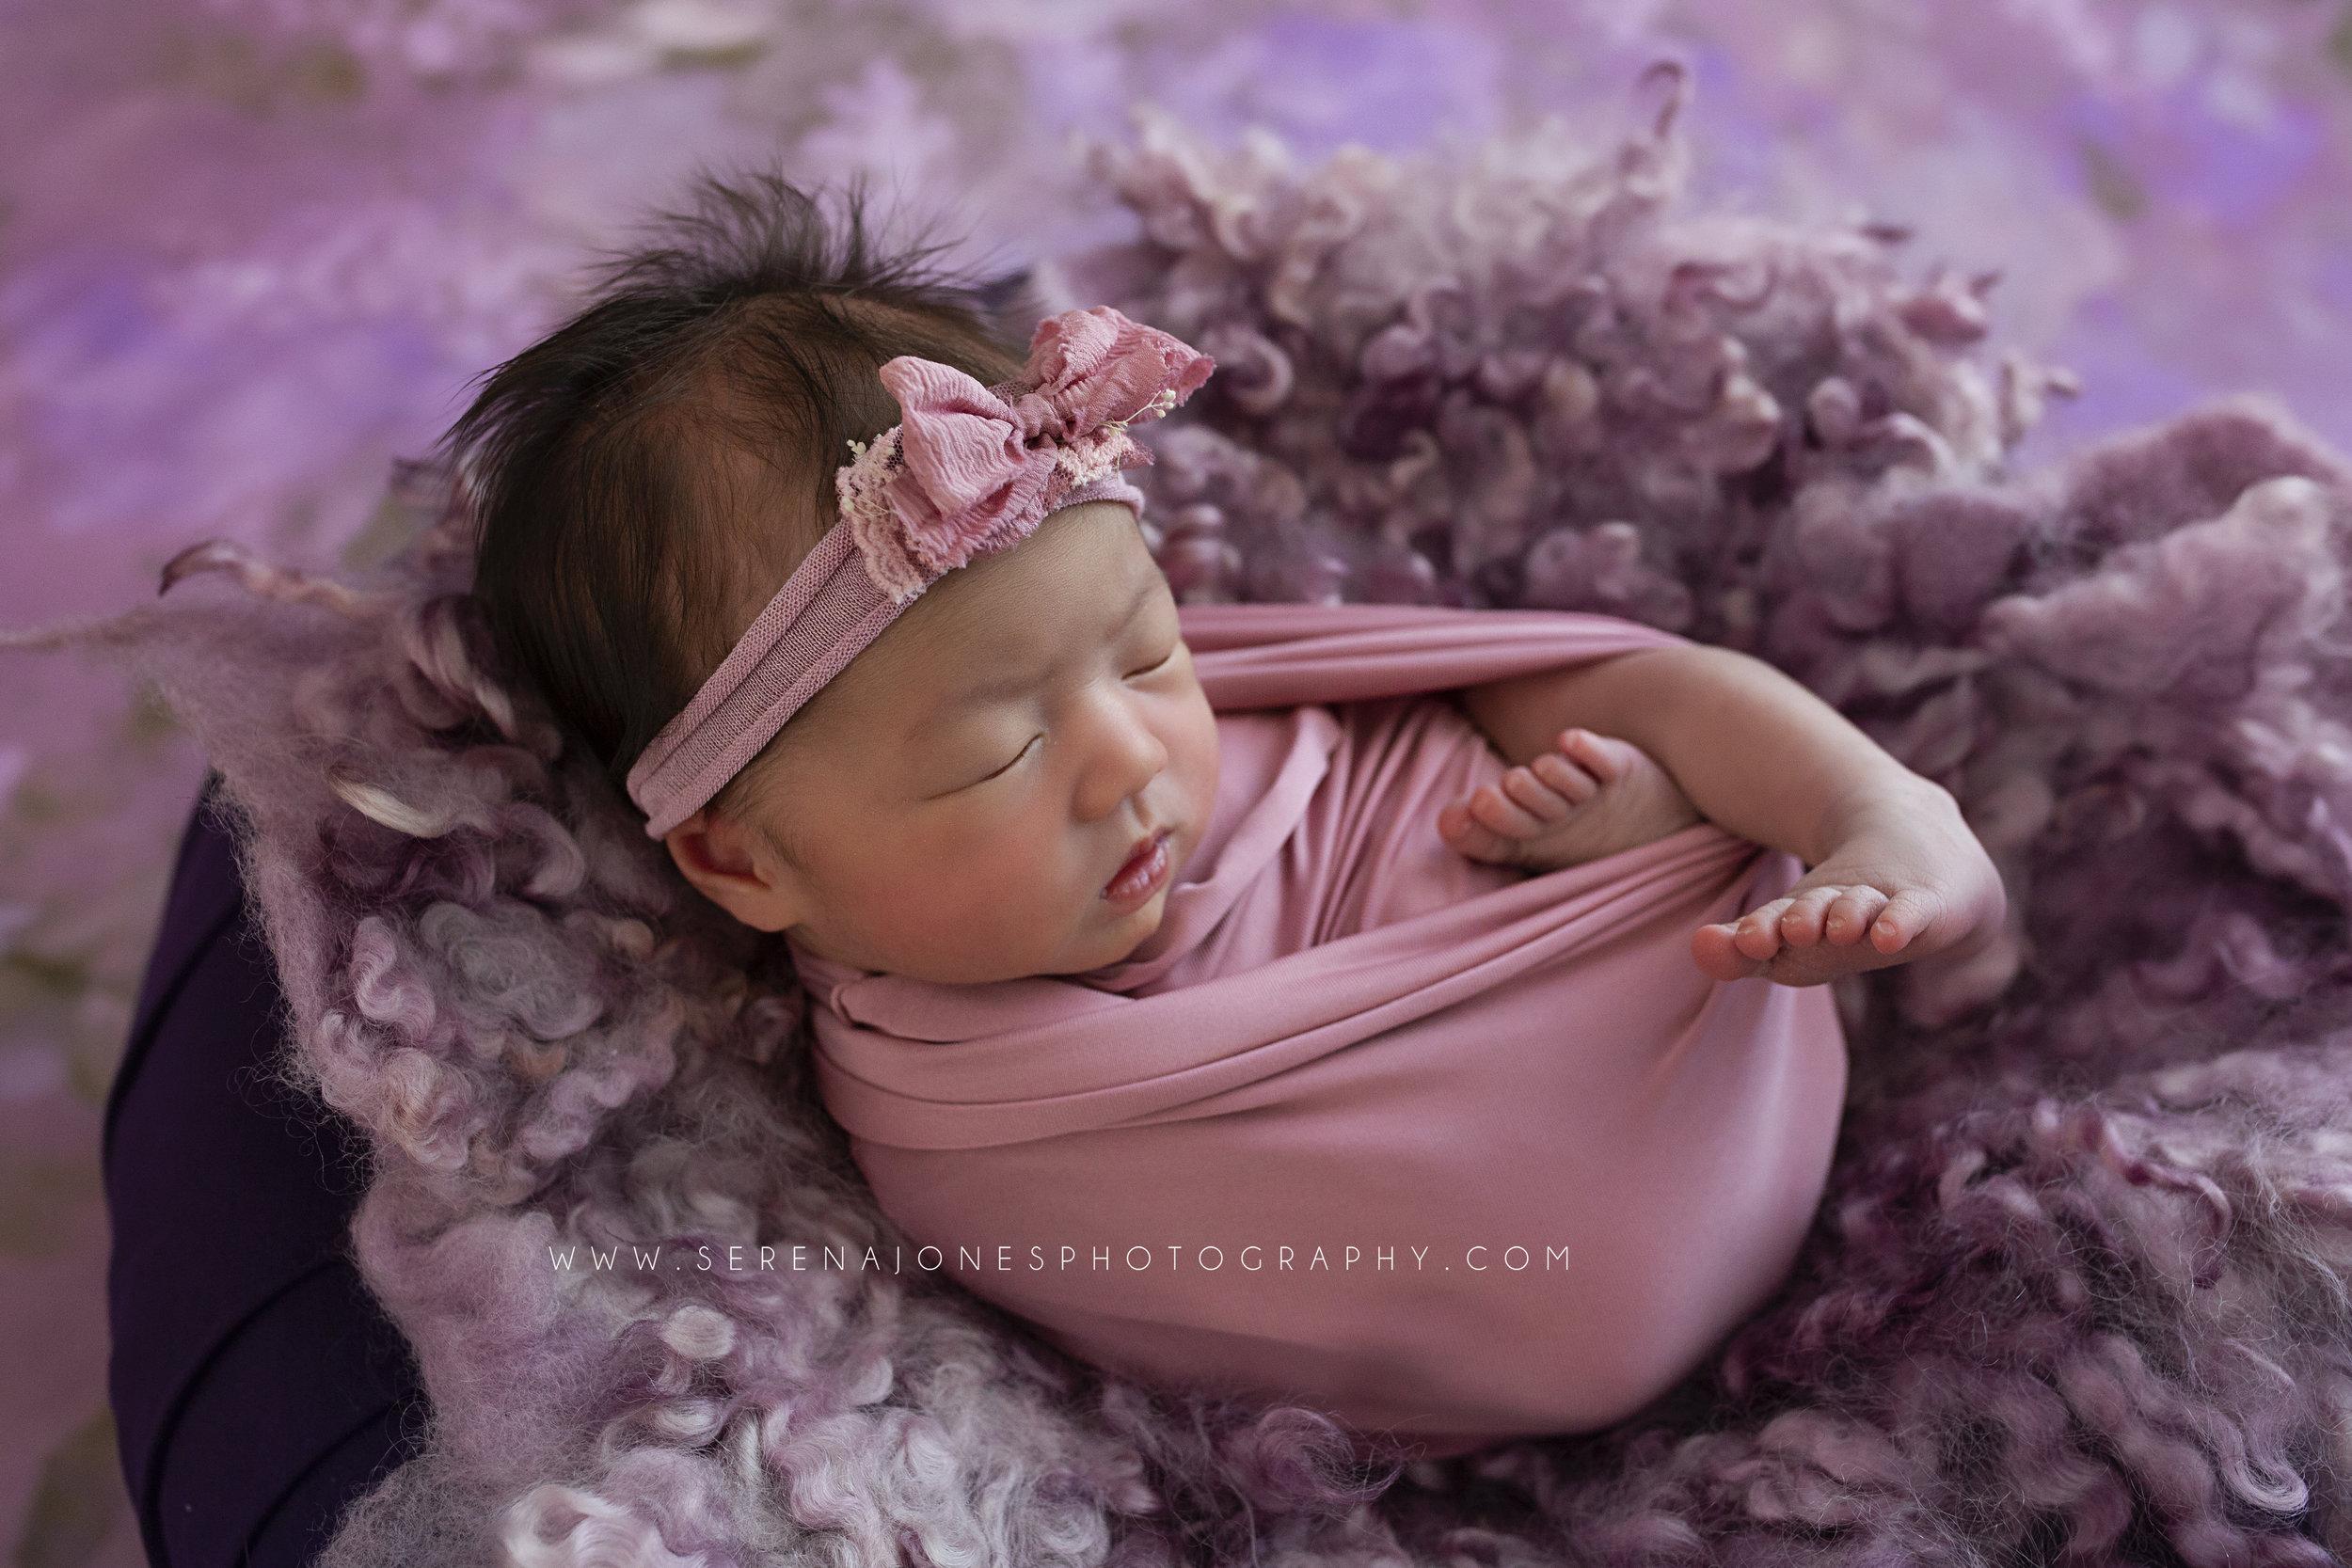 Serena Jones Photography - Sophia Gracielle Irawan - 3 FB.jpg